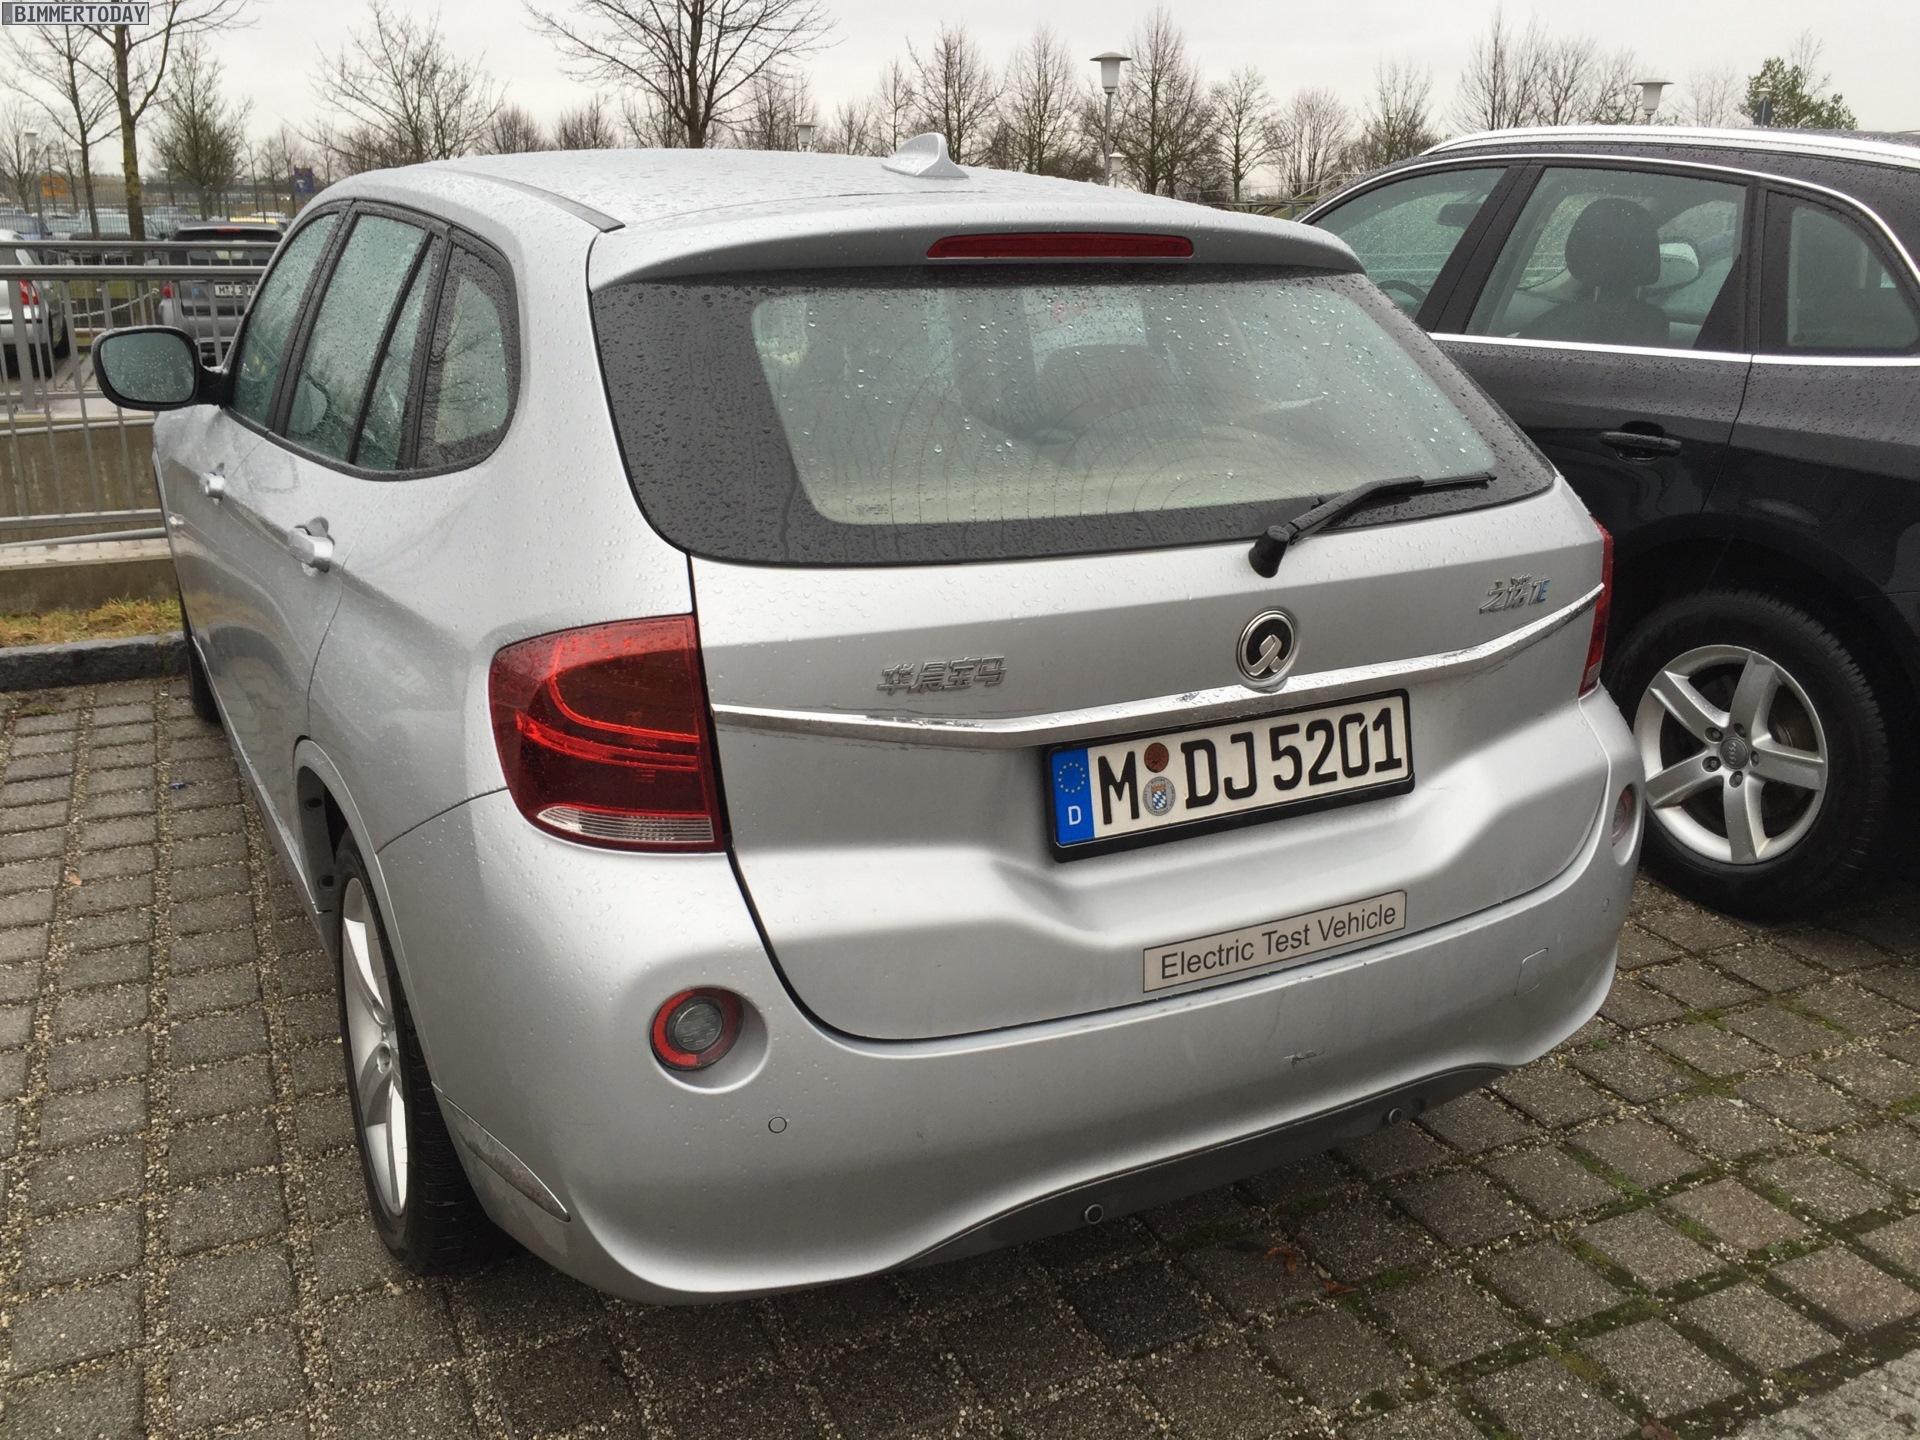 Zinoro 1e In München Bmw X1 Mit Elektro Antrieb Für China